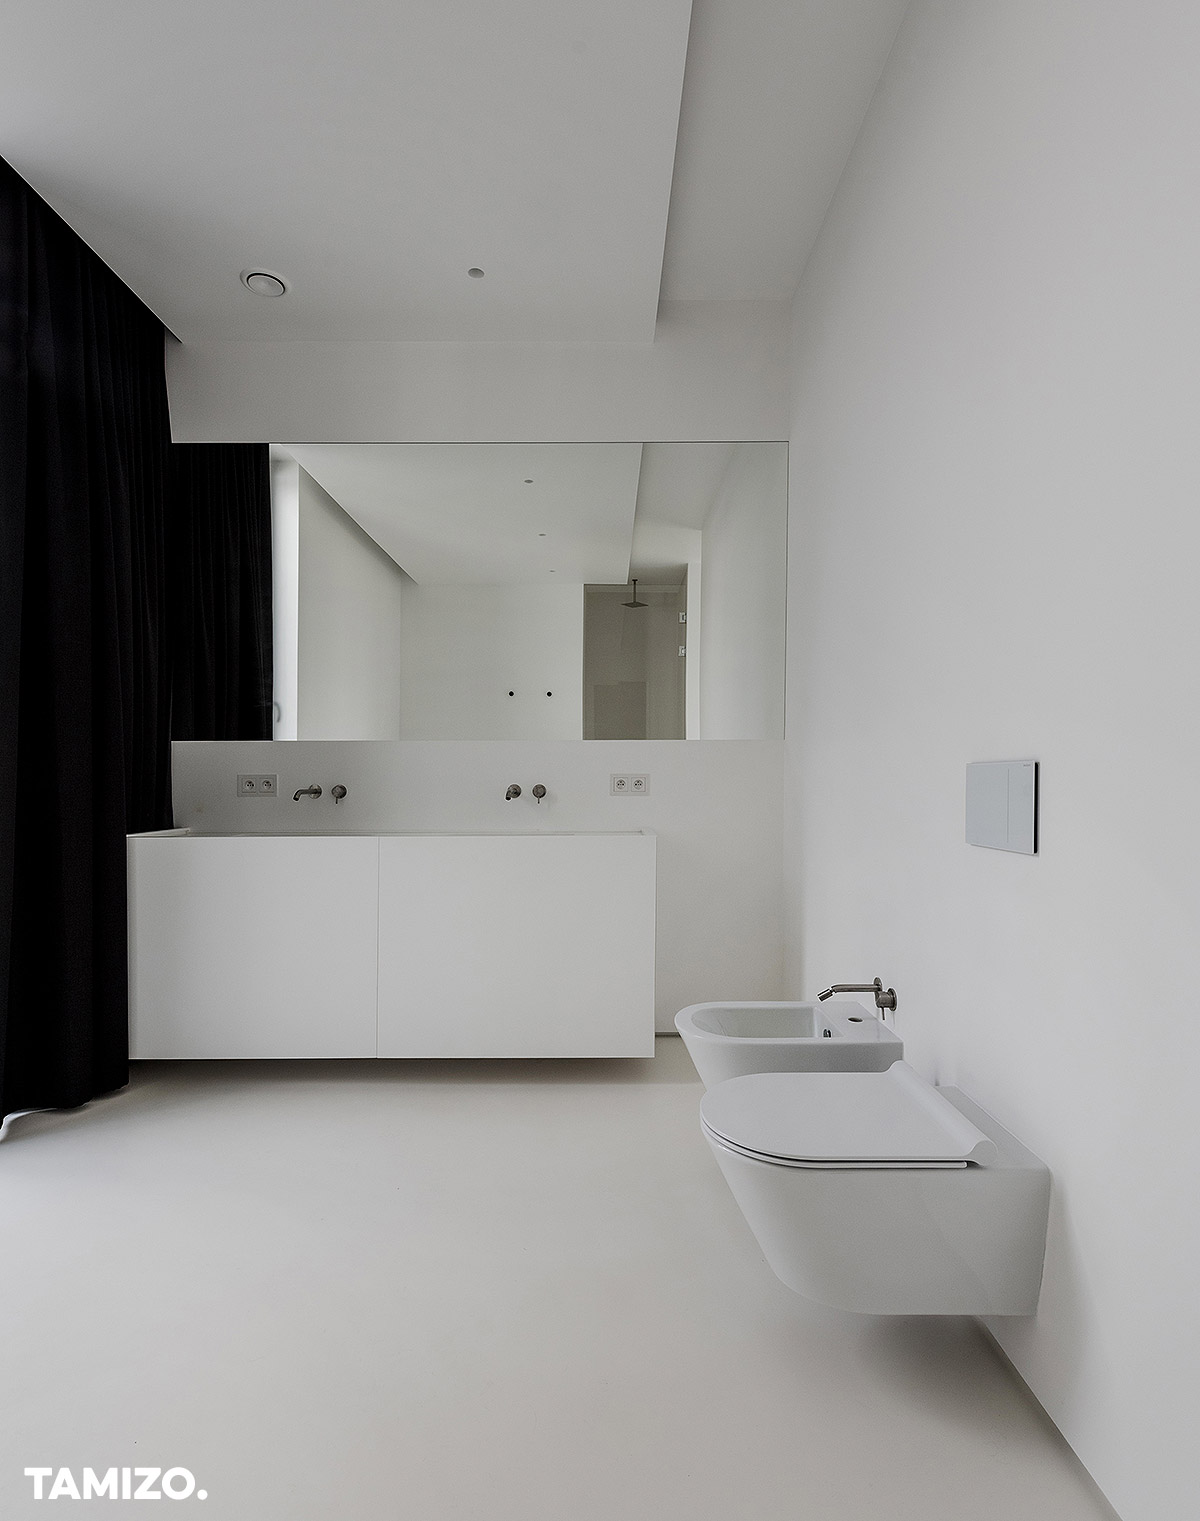 032_tamizo_architects_interior_house_realization_warsaw_poland_45